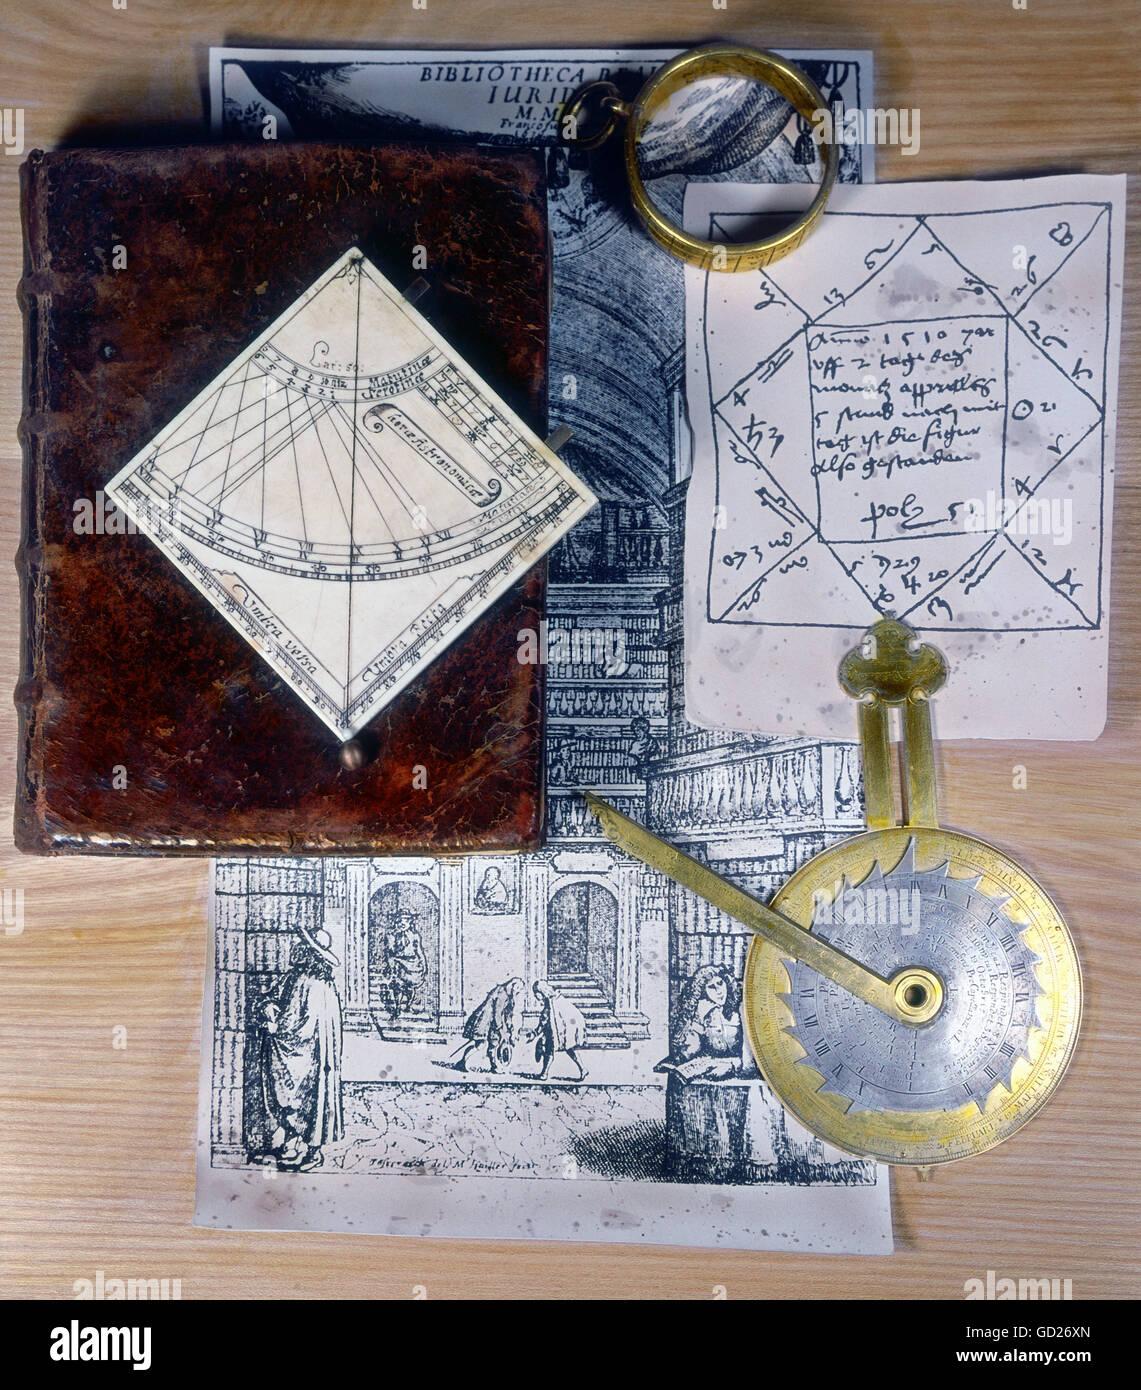 clocks, sundials, horizontal sundial, ring dial, night dial, engrave ivory plate, Augsburg, Germany, 17th century, - Stock Image